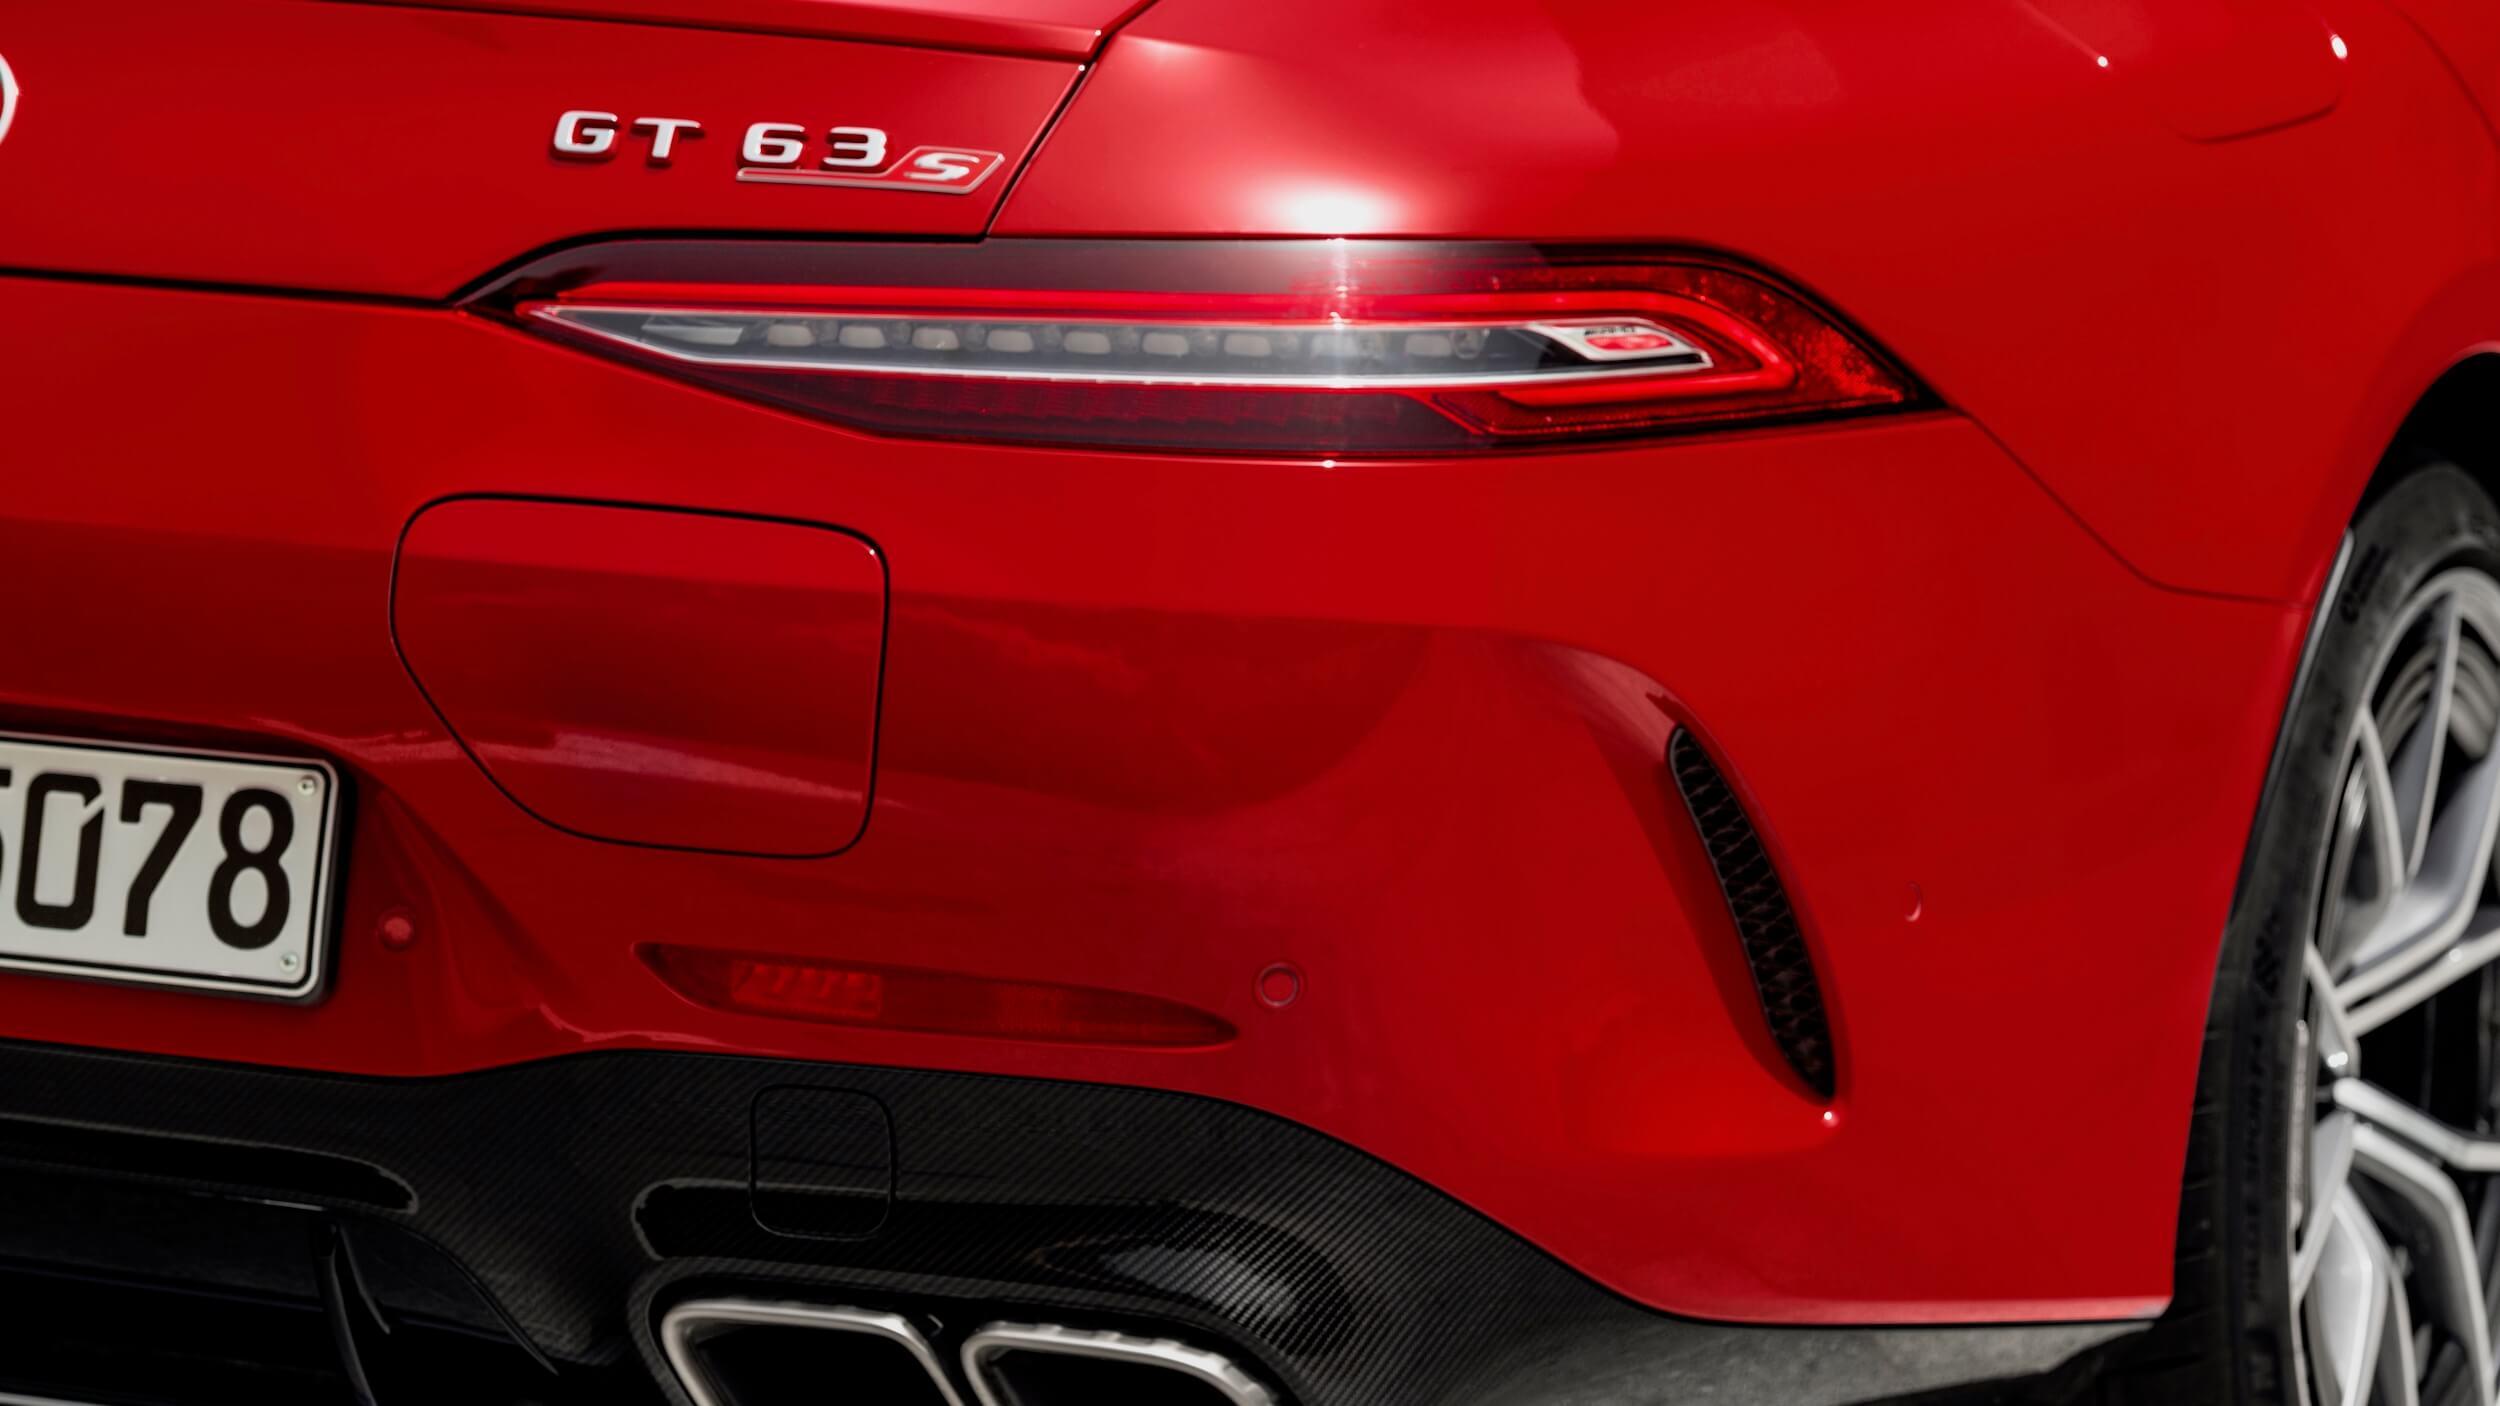 Mercedes AMG GT 63 S E Performance 10